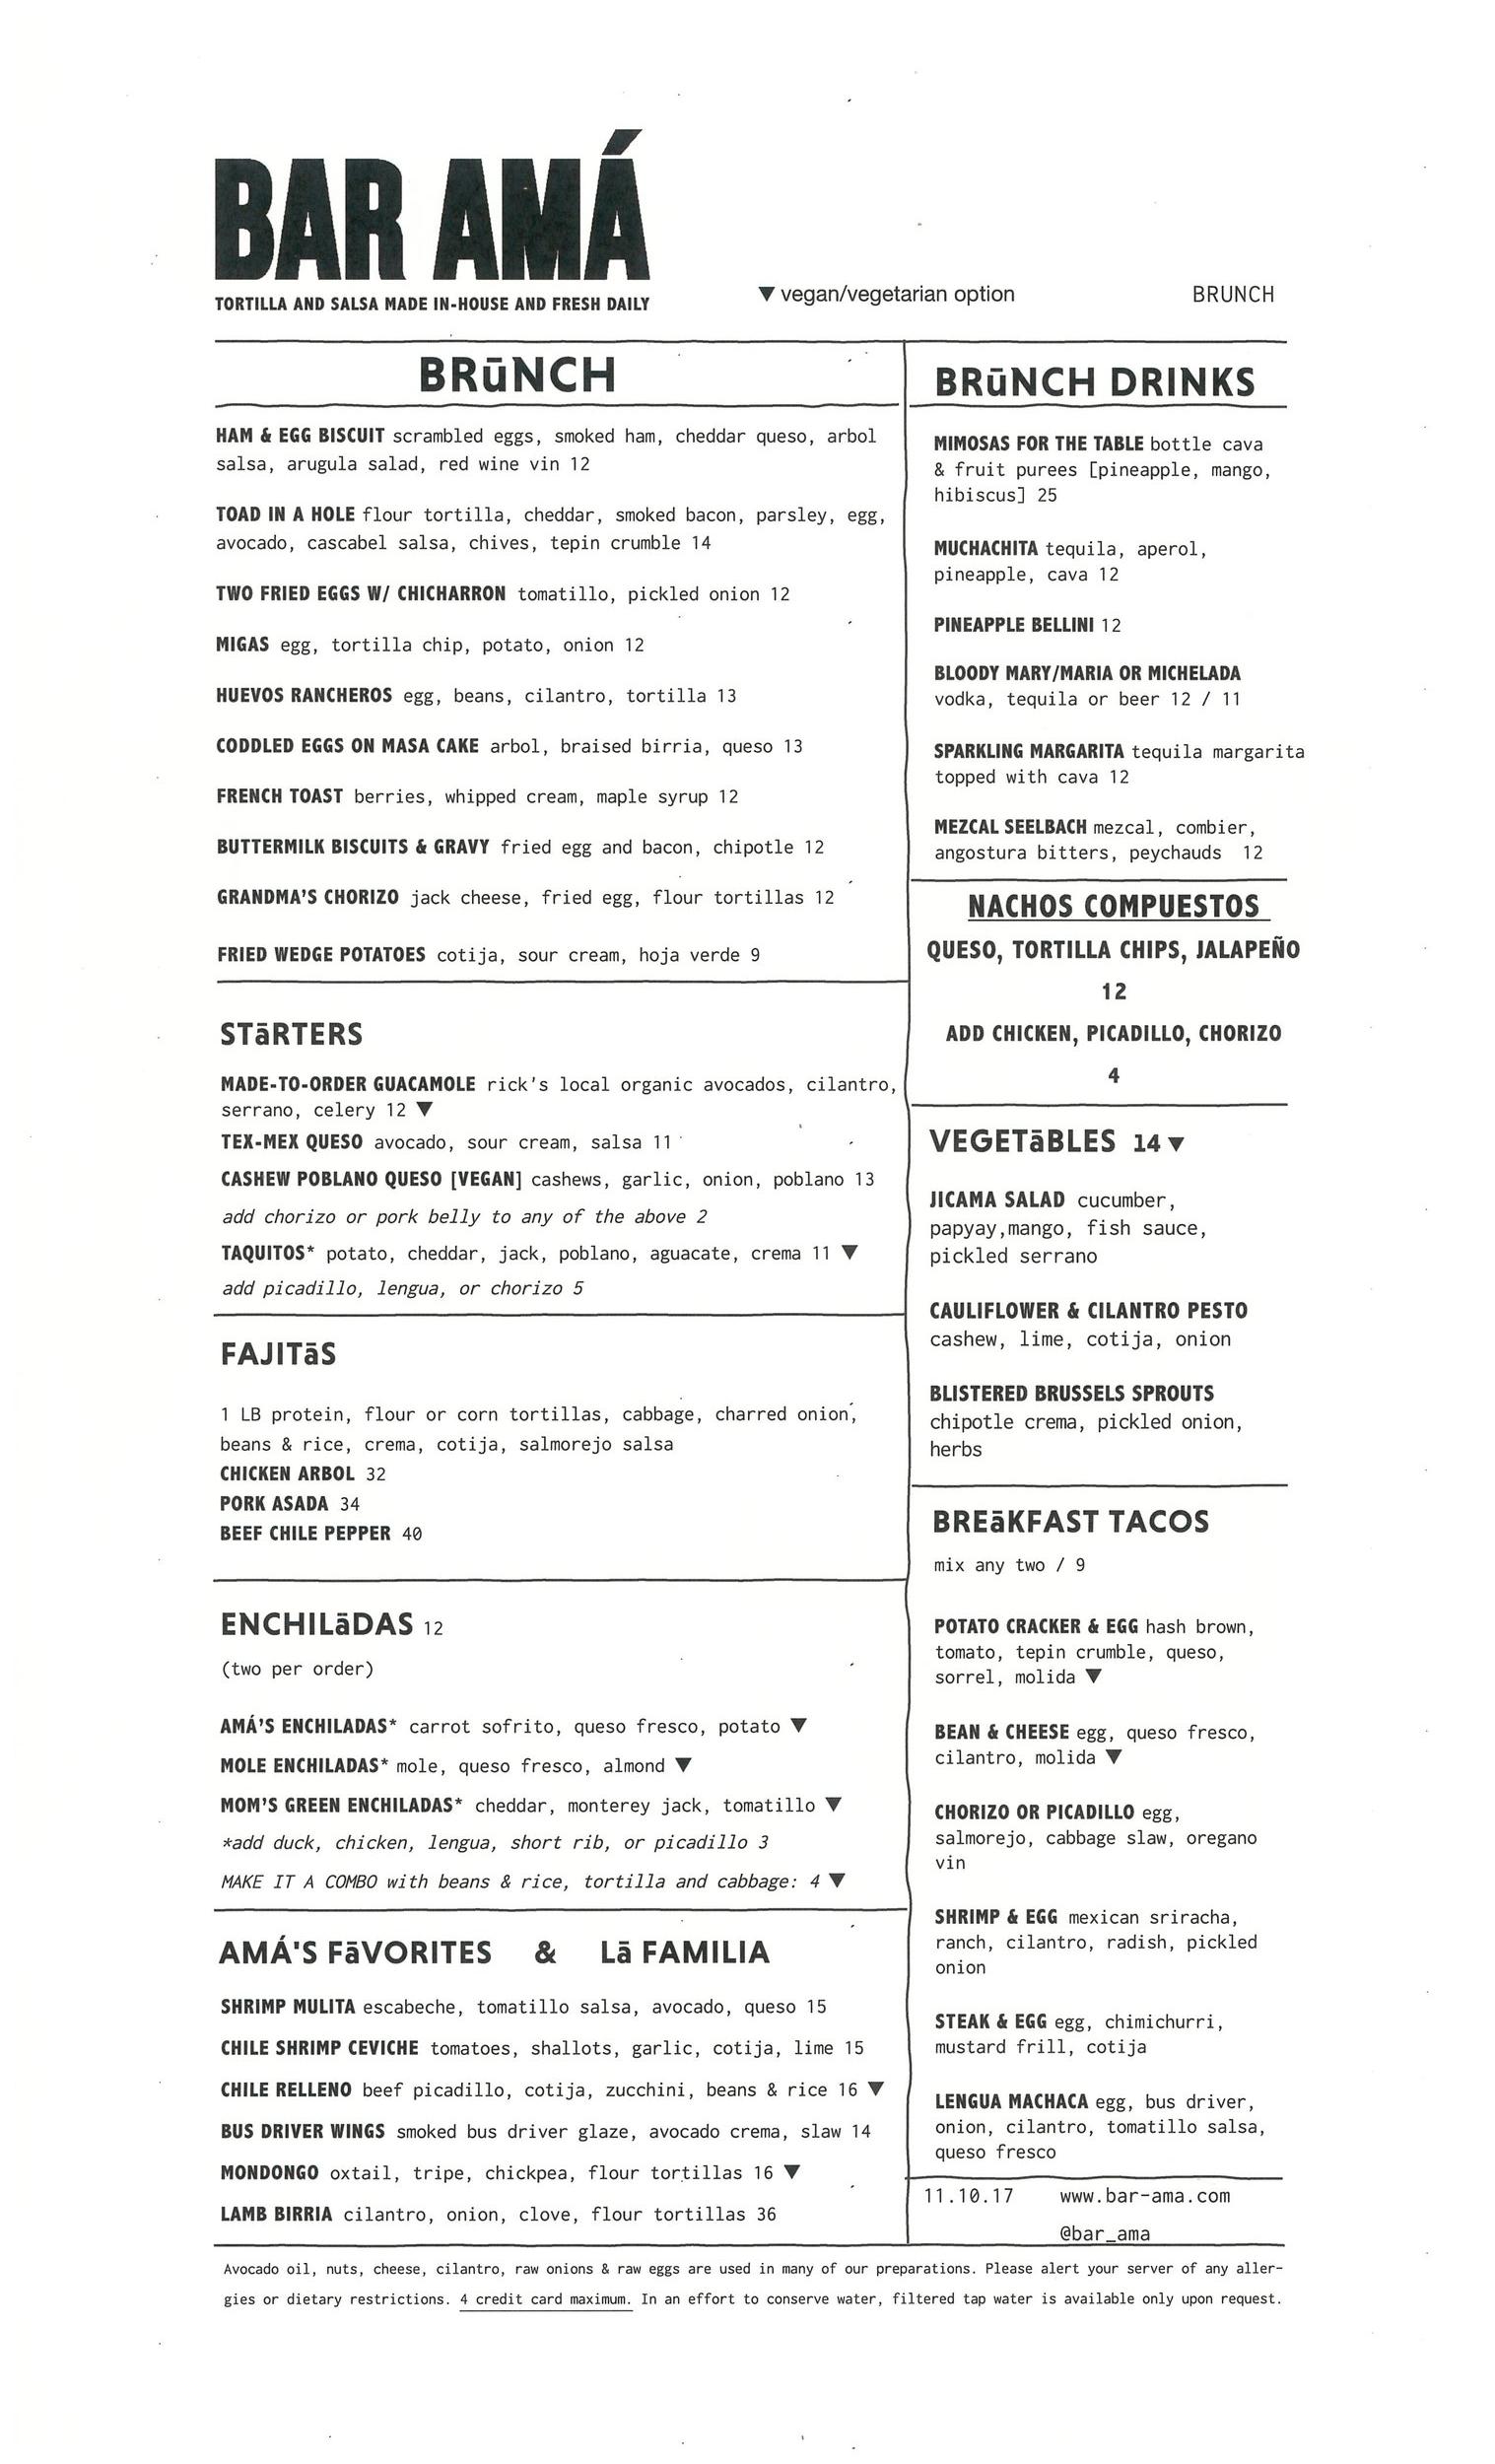 brunch menu: starters, brunch specialties, fajitas, enchiladas, Amá's favorites, vegetables, breakfast tacos, brunch drinks